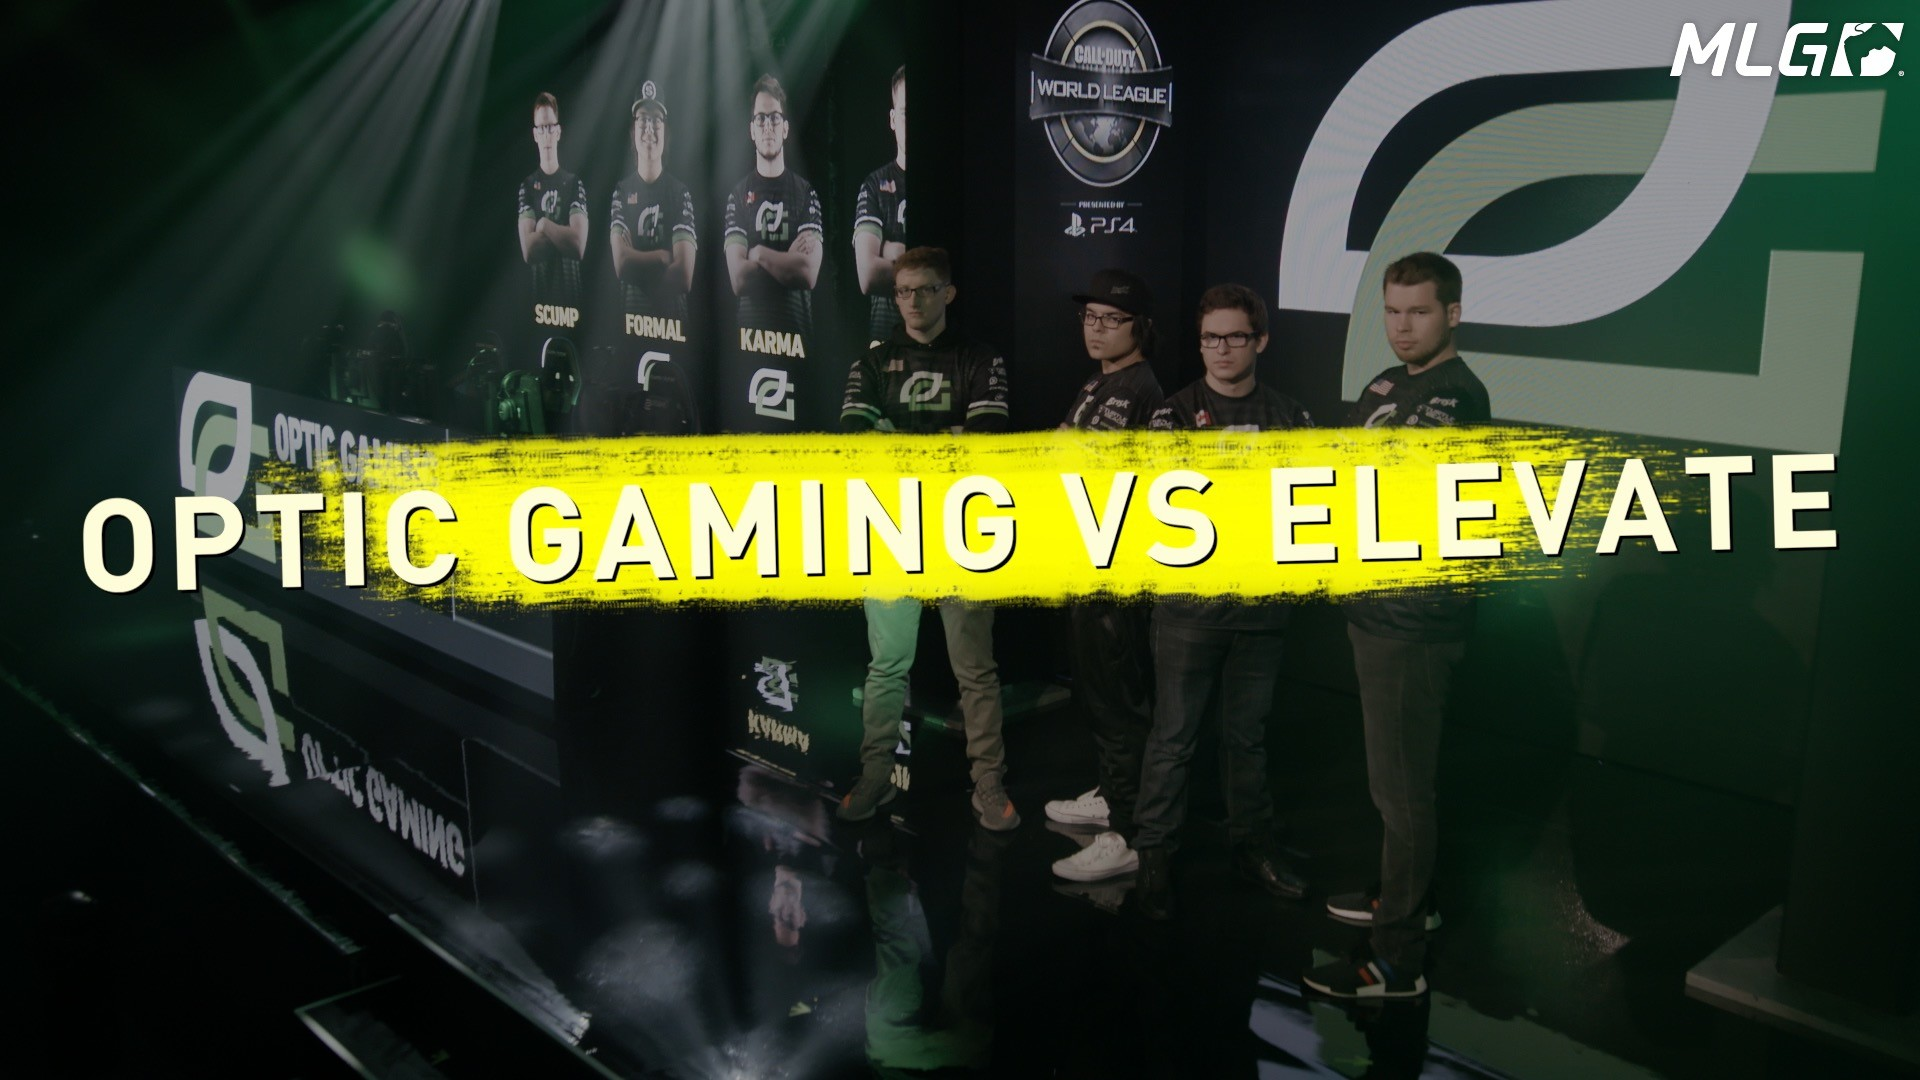 CWL GPL Group Green Optic Gaming vs. Elevate Matchup Video